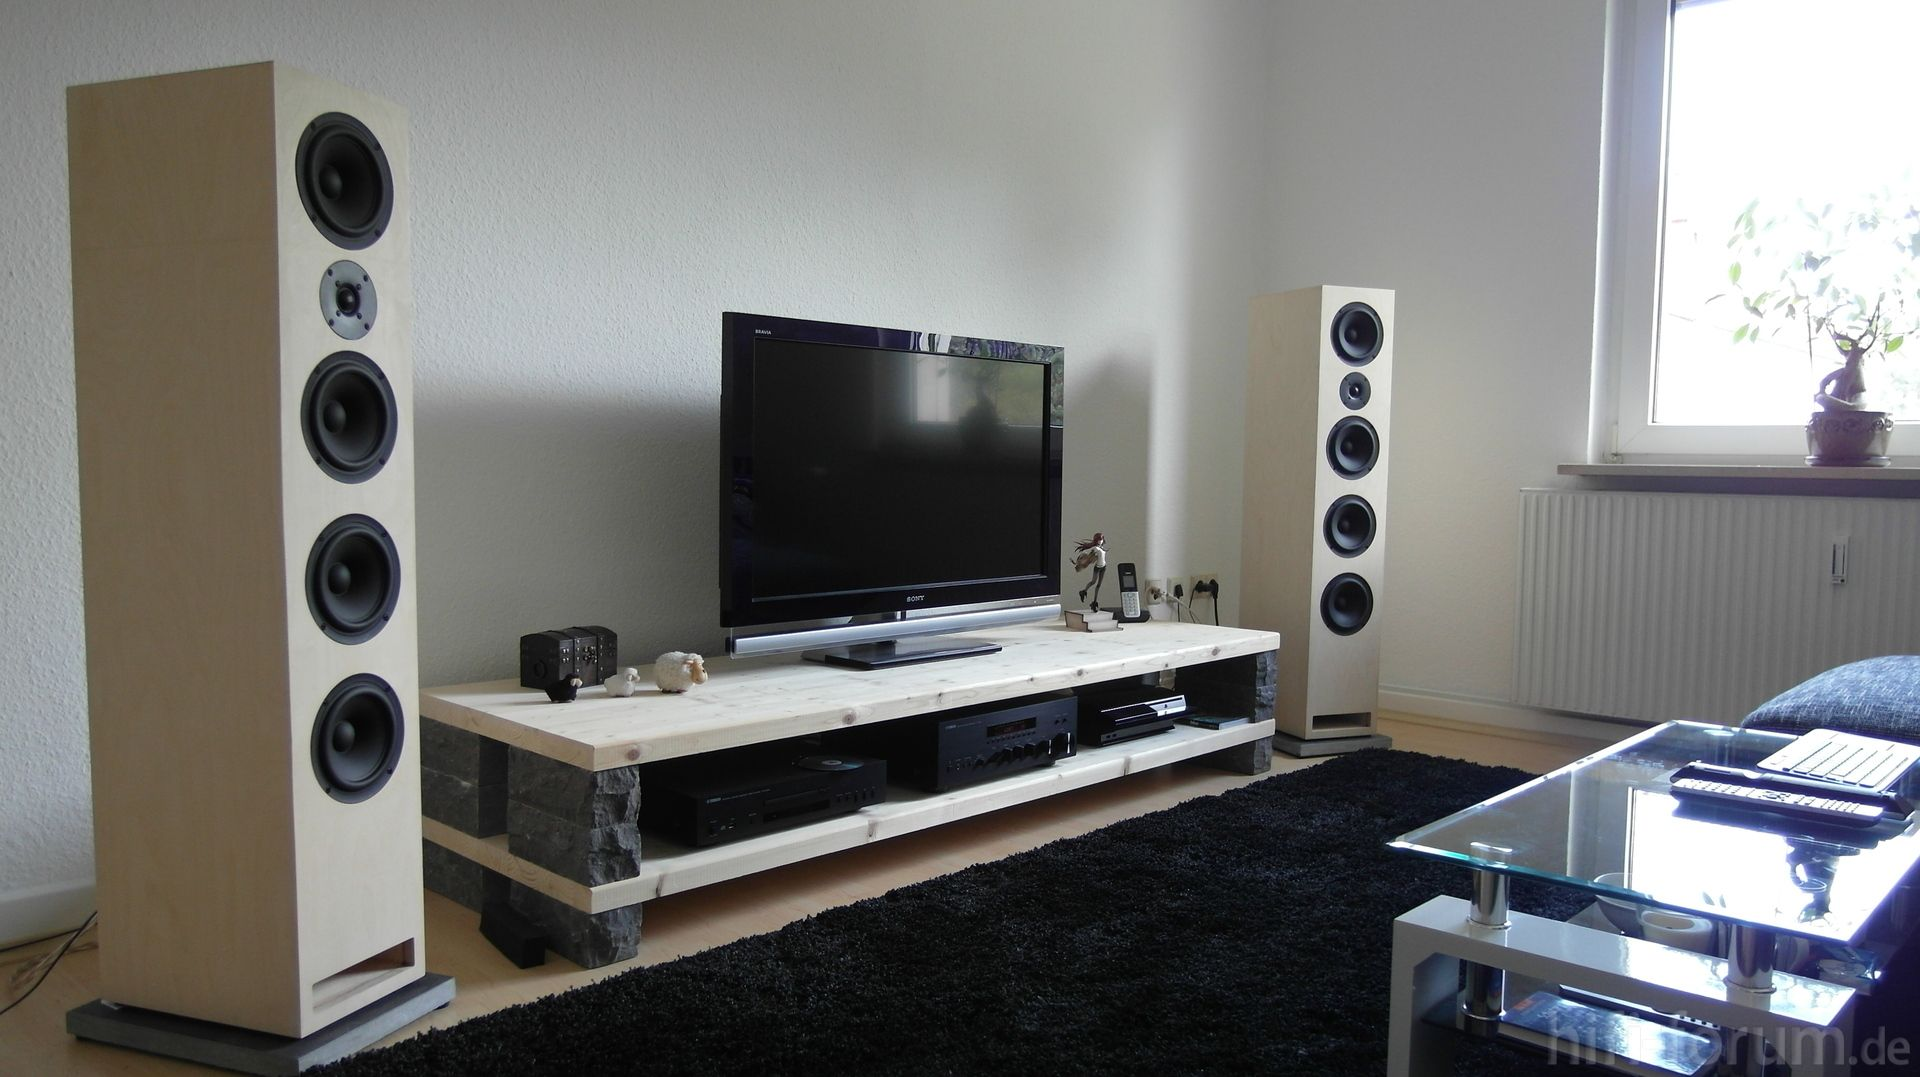 bilder eurer selbstbau racks racks geh use hifi forum seite 73 tv und entertainment. Black Bedroom Furniture Sets. Home Design Ideas